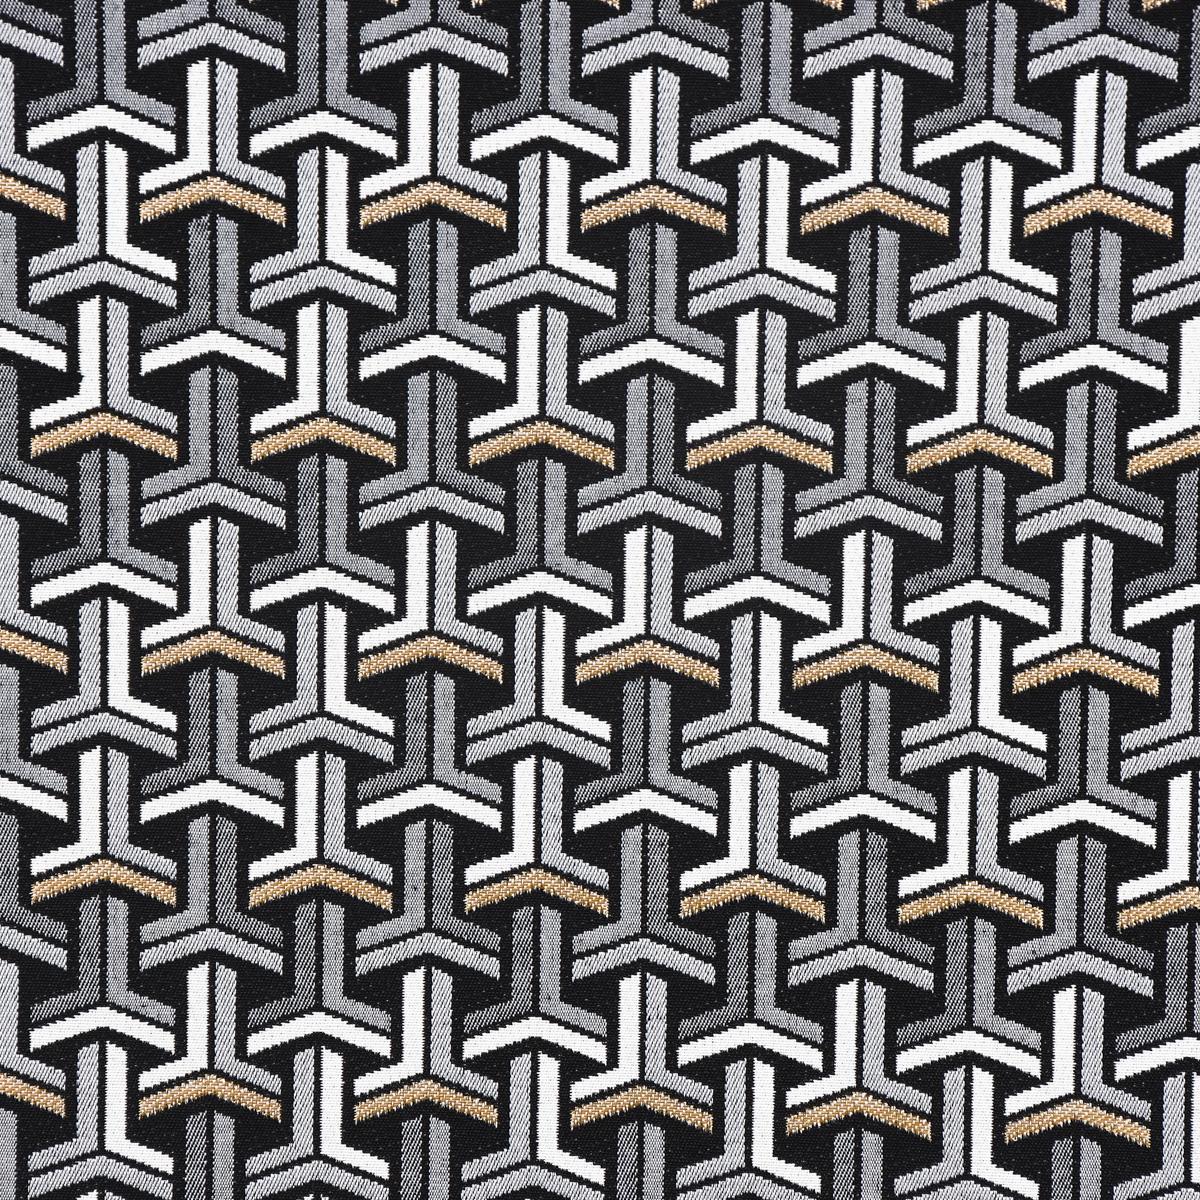 dekostoff jacquard stoff grafisch t schwarz wei goldfarbig stoffe wohnstoffe gobelin doubleface. Black Bedroom Furniture Sets. Home Design Ideas